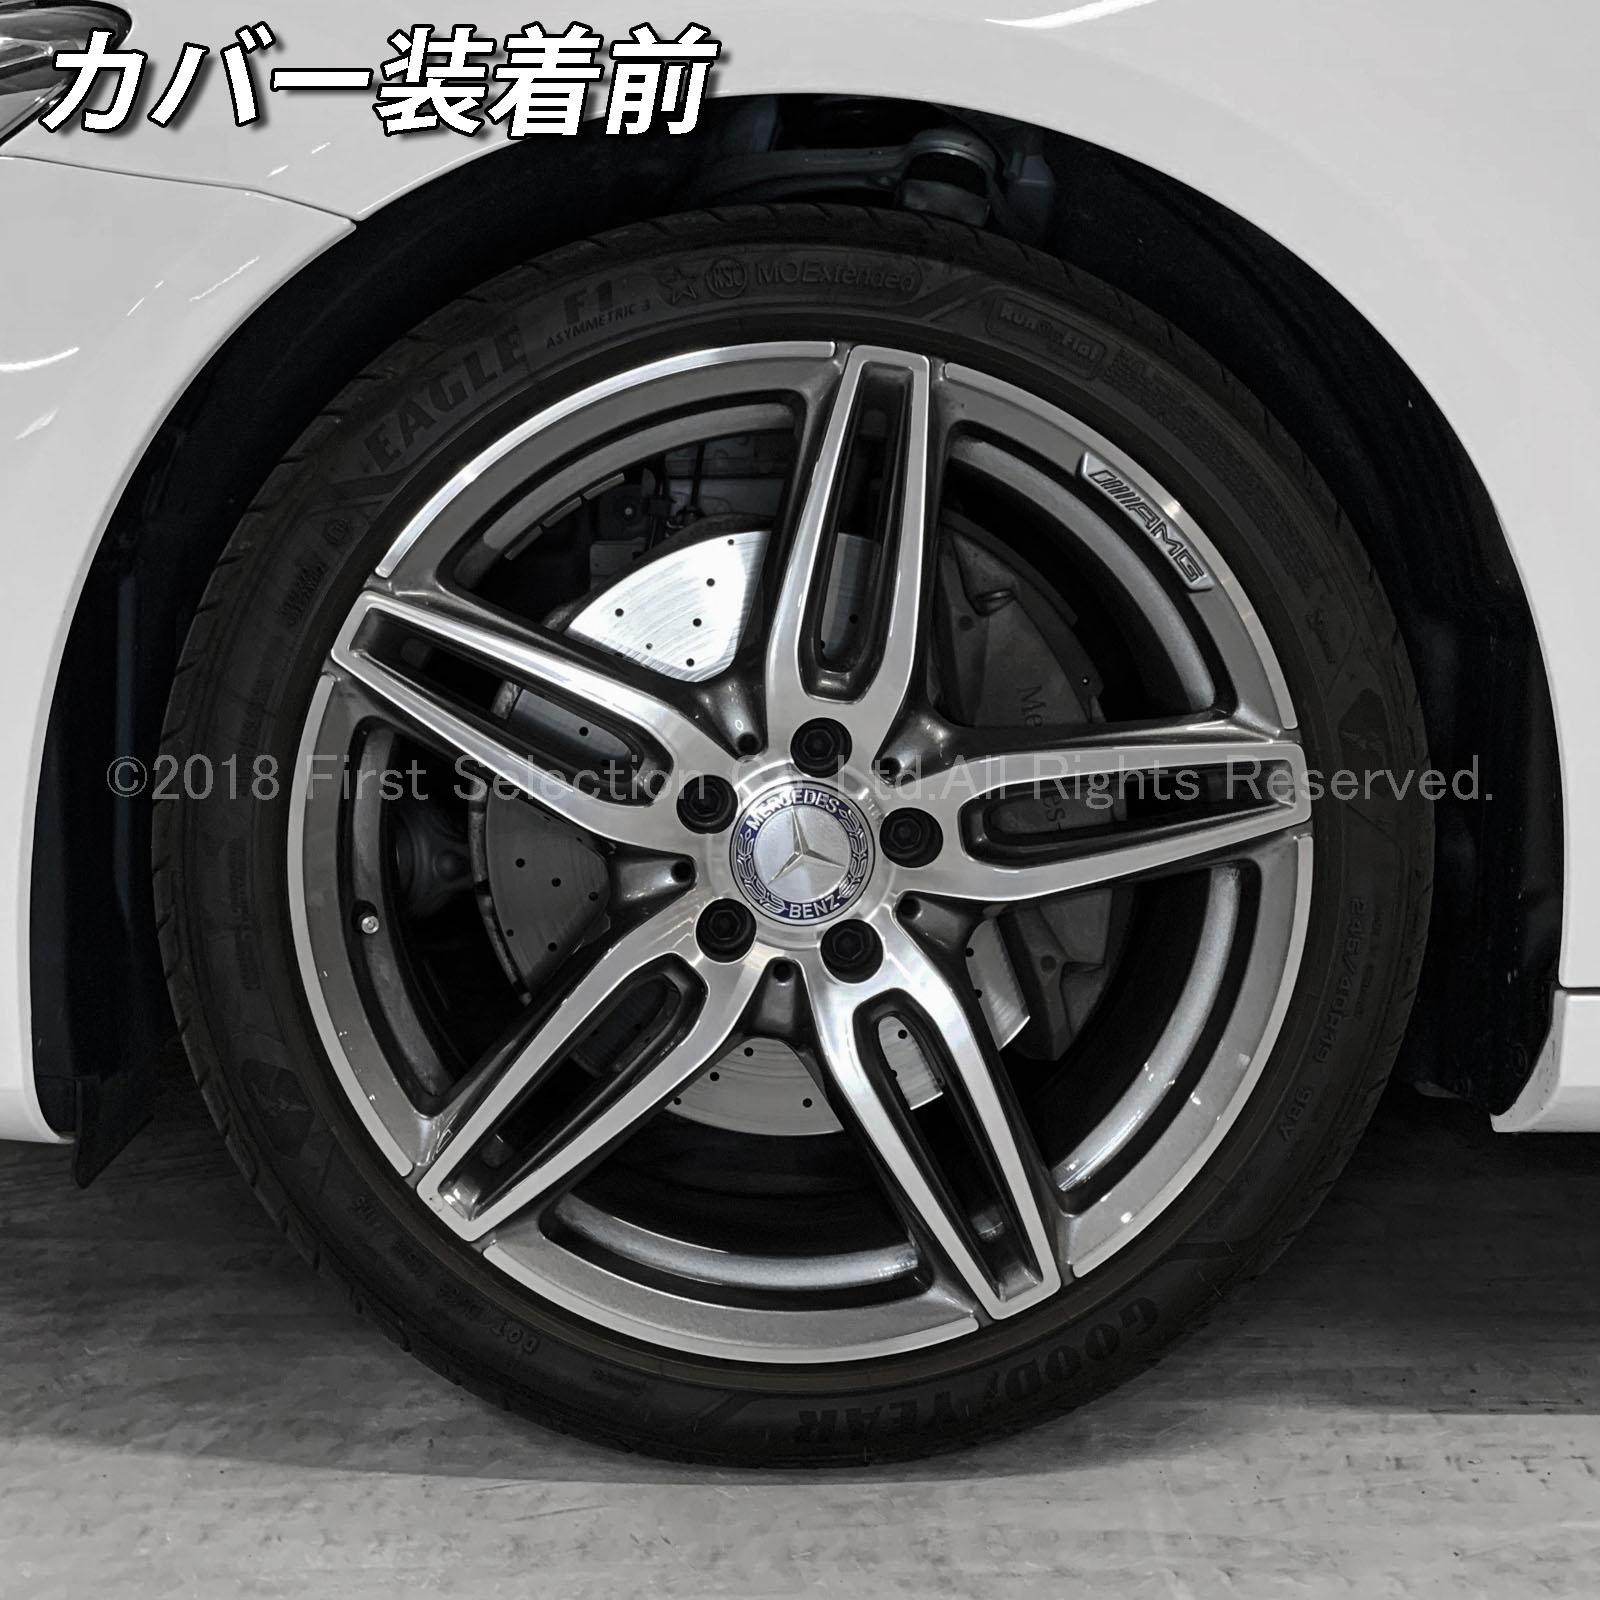 Mercedes-Benz ベンツ AMG銀文字 Eクラス W213 S213 AVANTGARDE Sports用 高耐久金属製キャリパーカバーセット赤 W213 S213 E200アバンギャルドスポーツ E220dアバンギャルドスポーツ E250アバンギャルドスポーツ